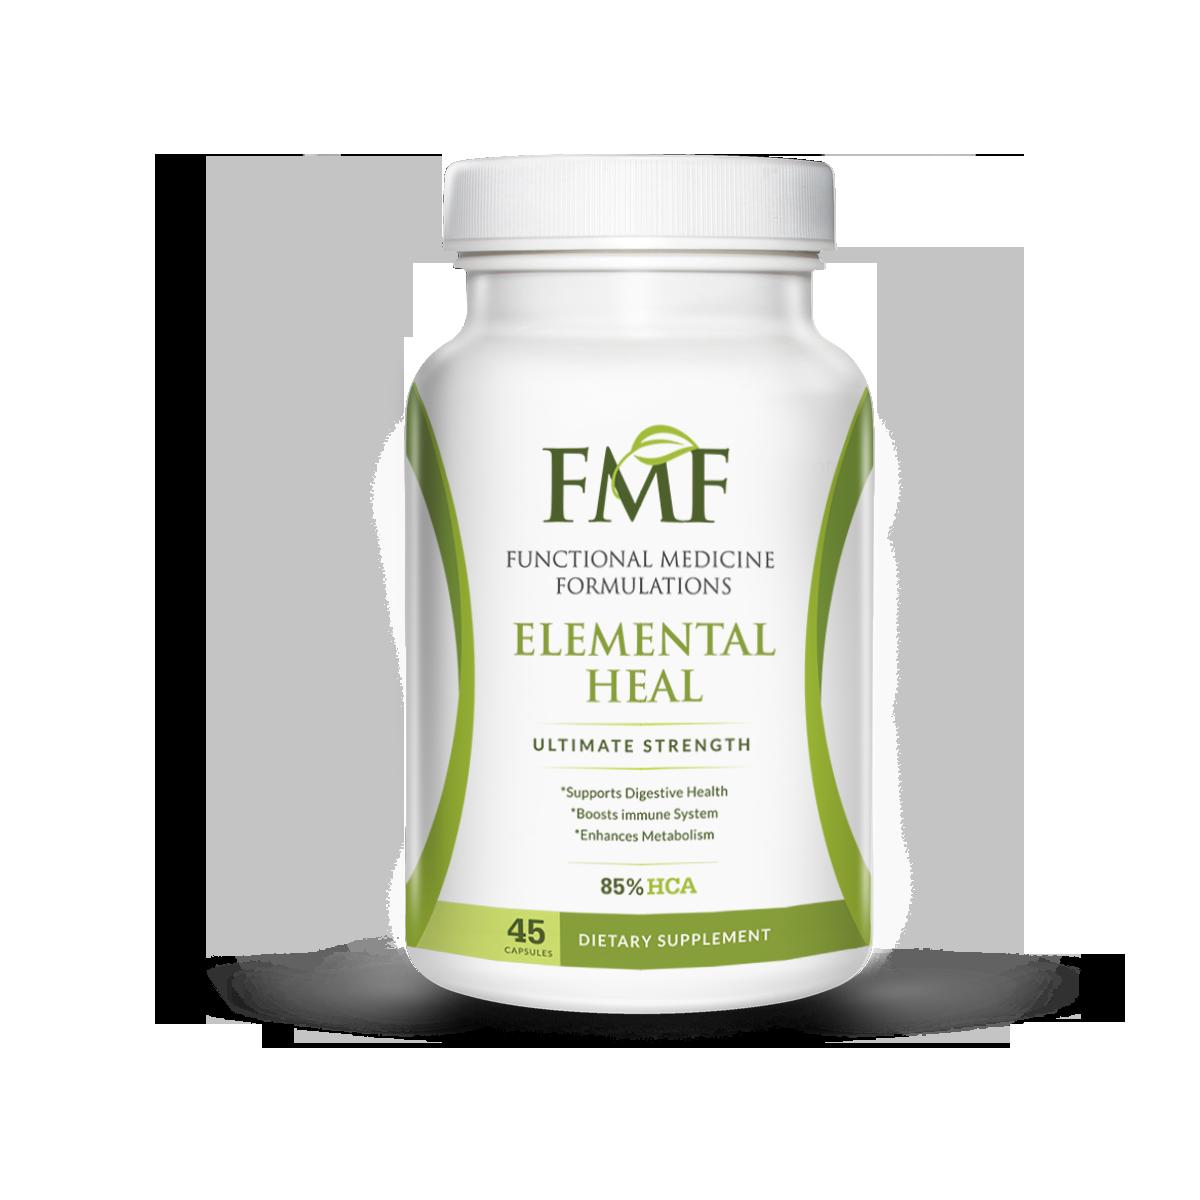 Nutritional Supplement Label Design